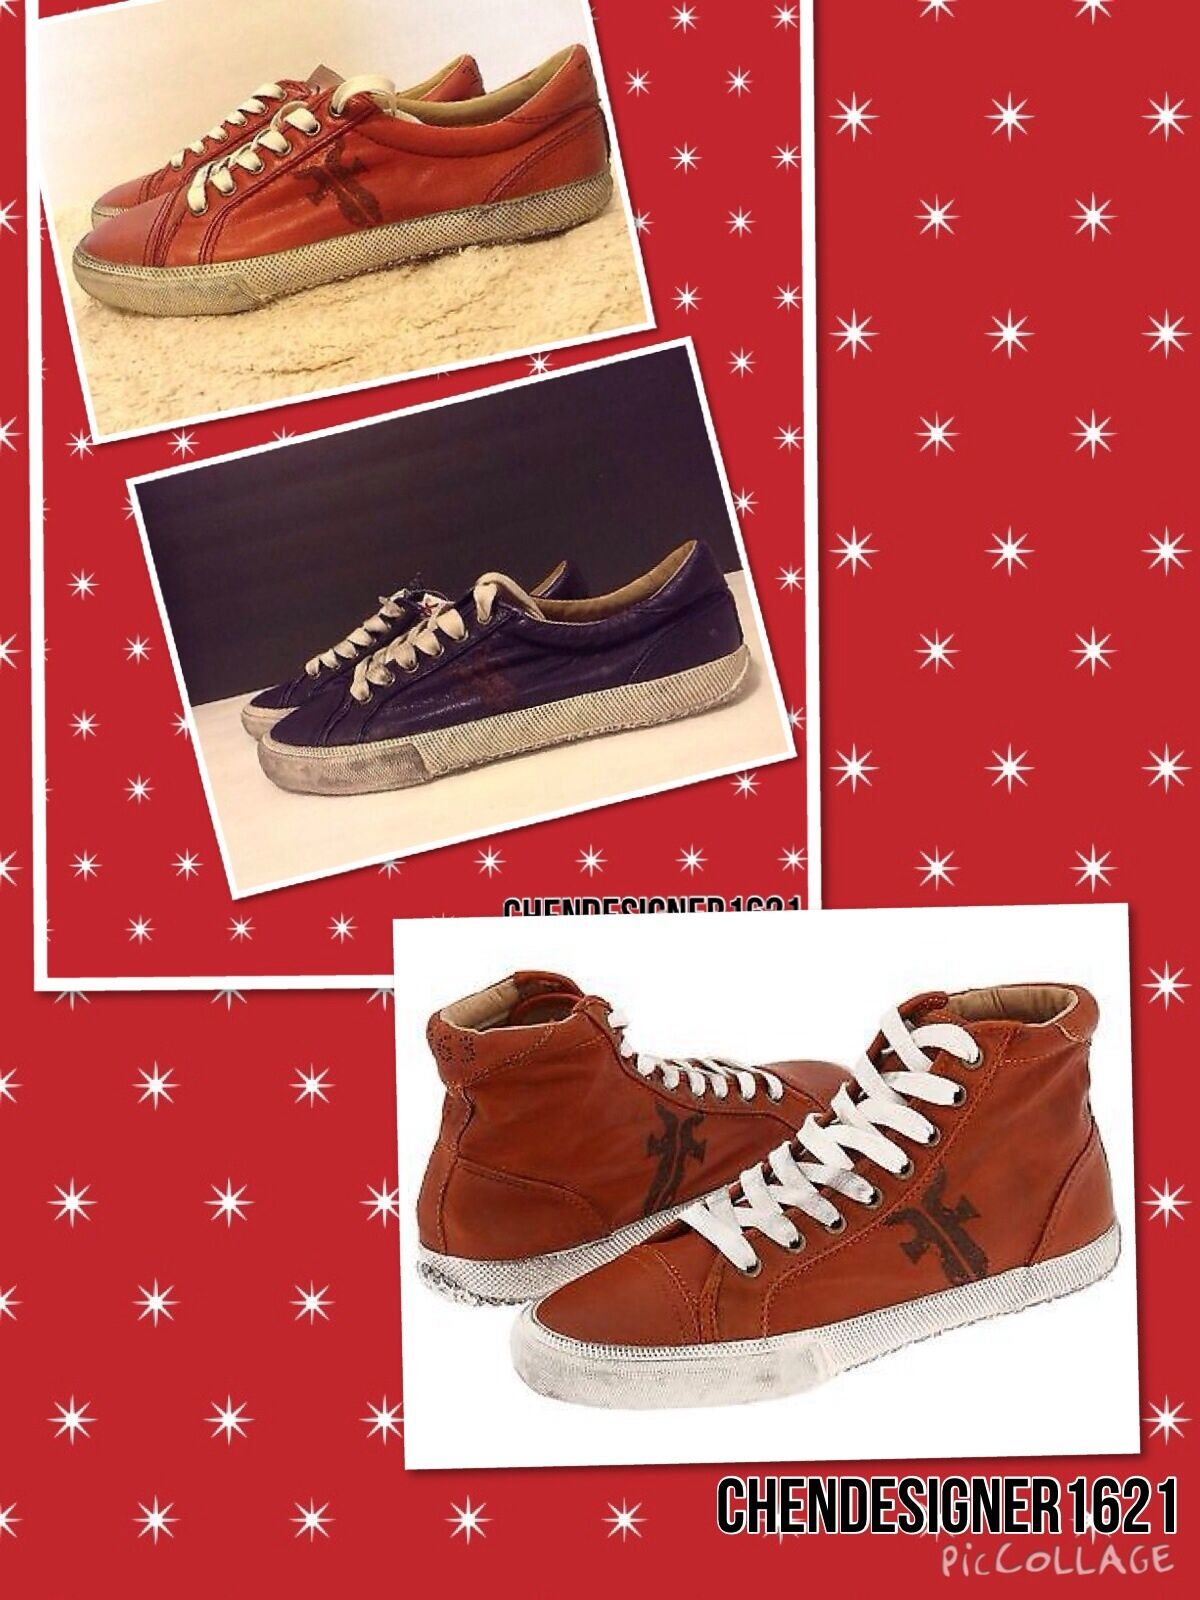 Frye Cuero Tamaño Tamaño Tamaño 8,9,10 Kira baja o alta Top tenis zapatillas de encaje, púrpura, vino  promociones de equipo